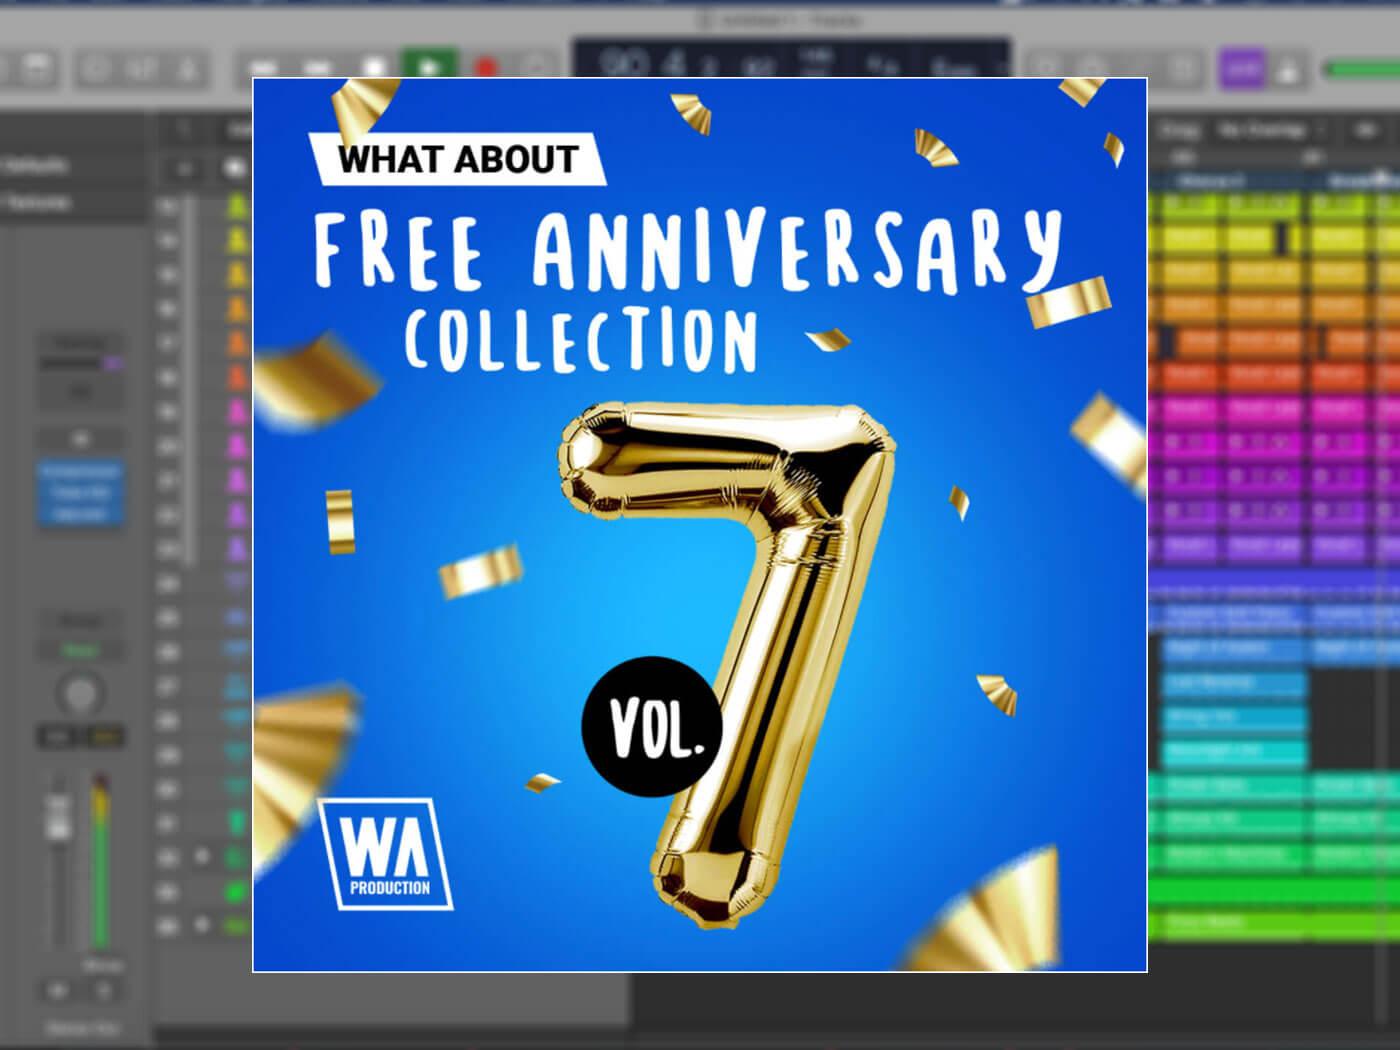 WA Production Free Anniversary Collection Vol 7